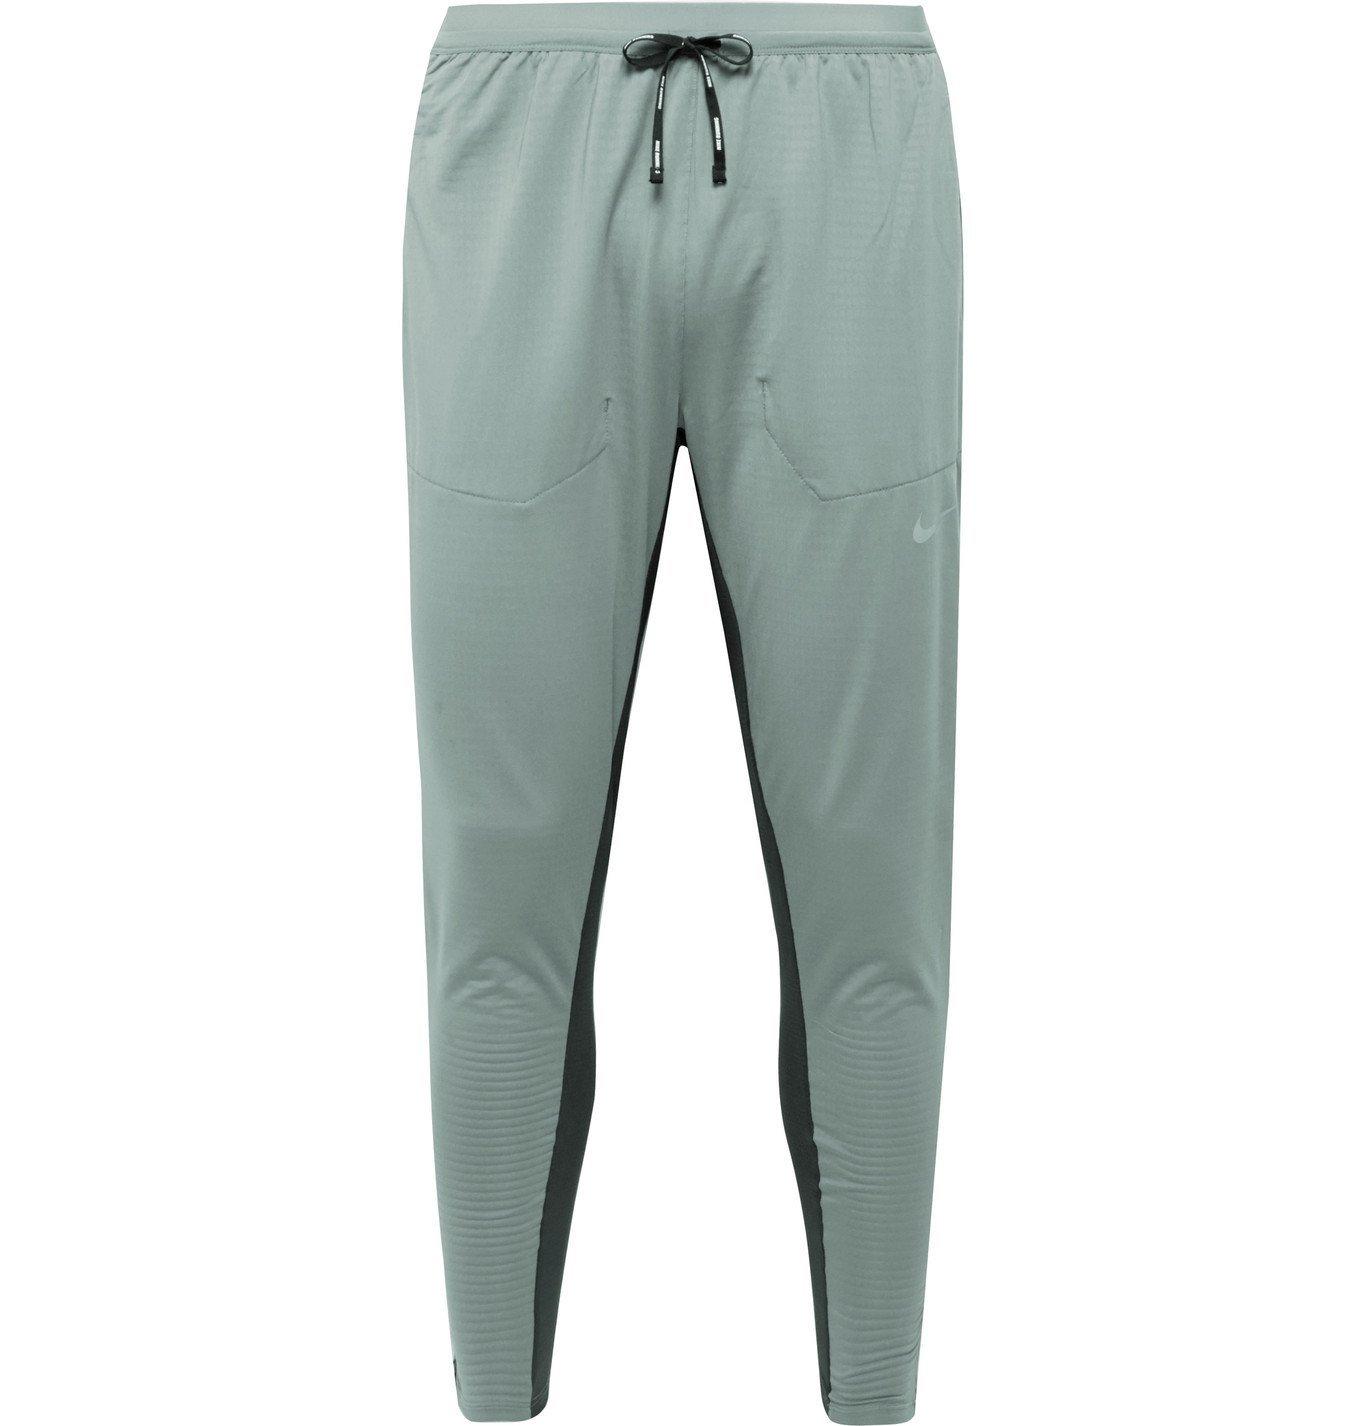 Nike Running - Phenom Elite Slim-Fit Tapered Mesh-Panelled Stretch-Jersey Sweatpants - Gray